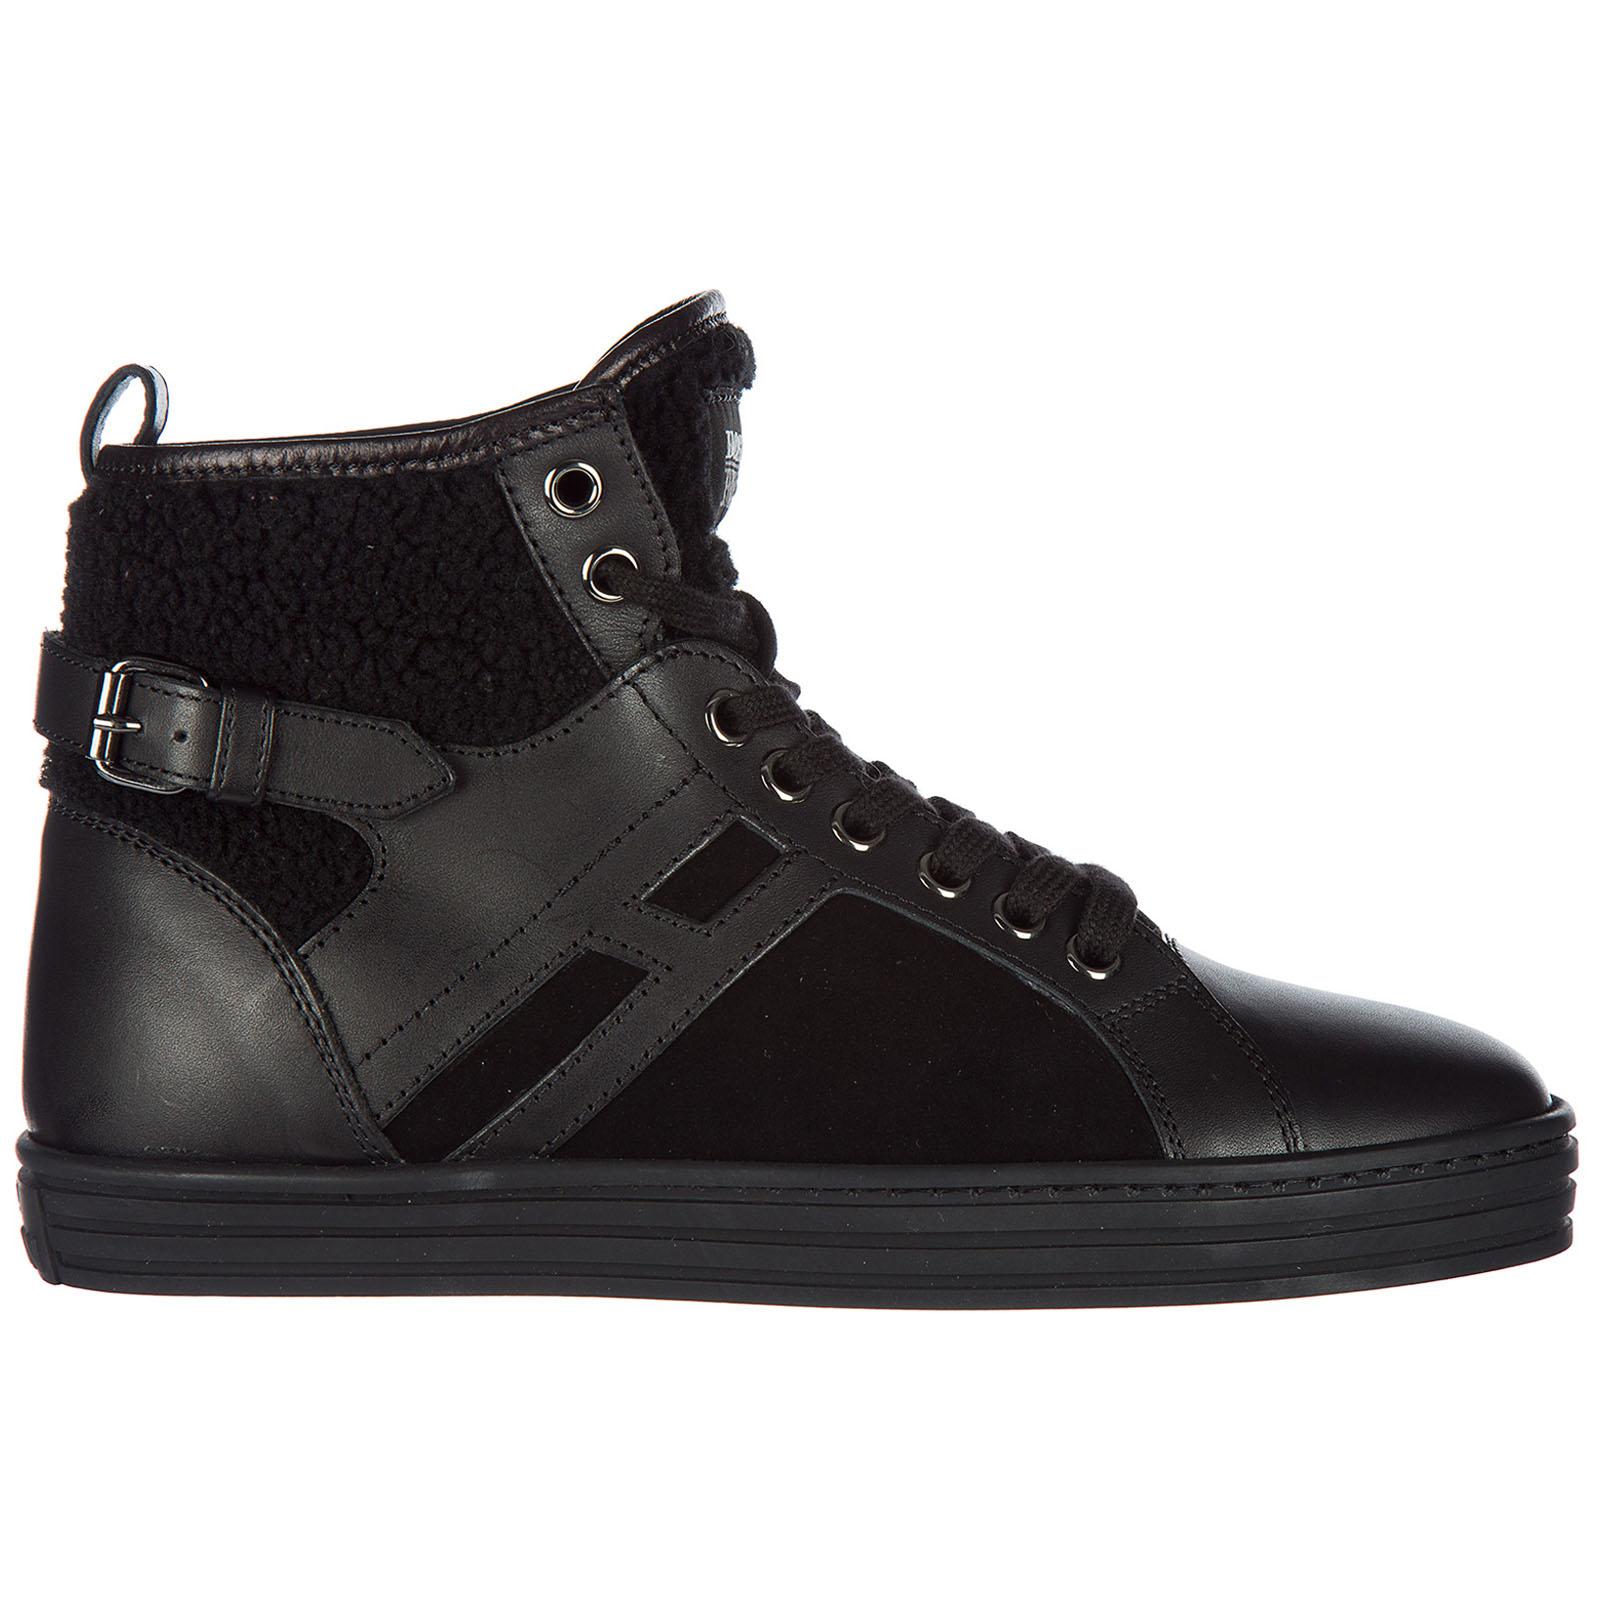 Scarpe sneakers alte donna in pelle r182 mid cut